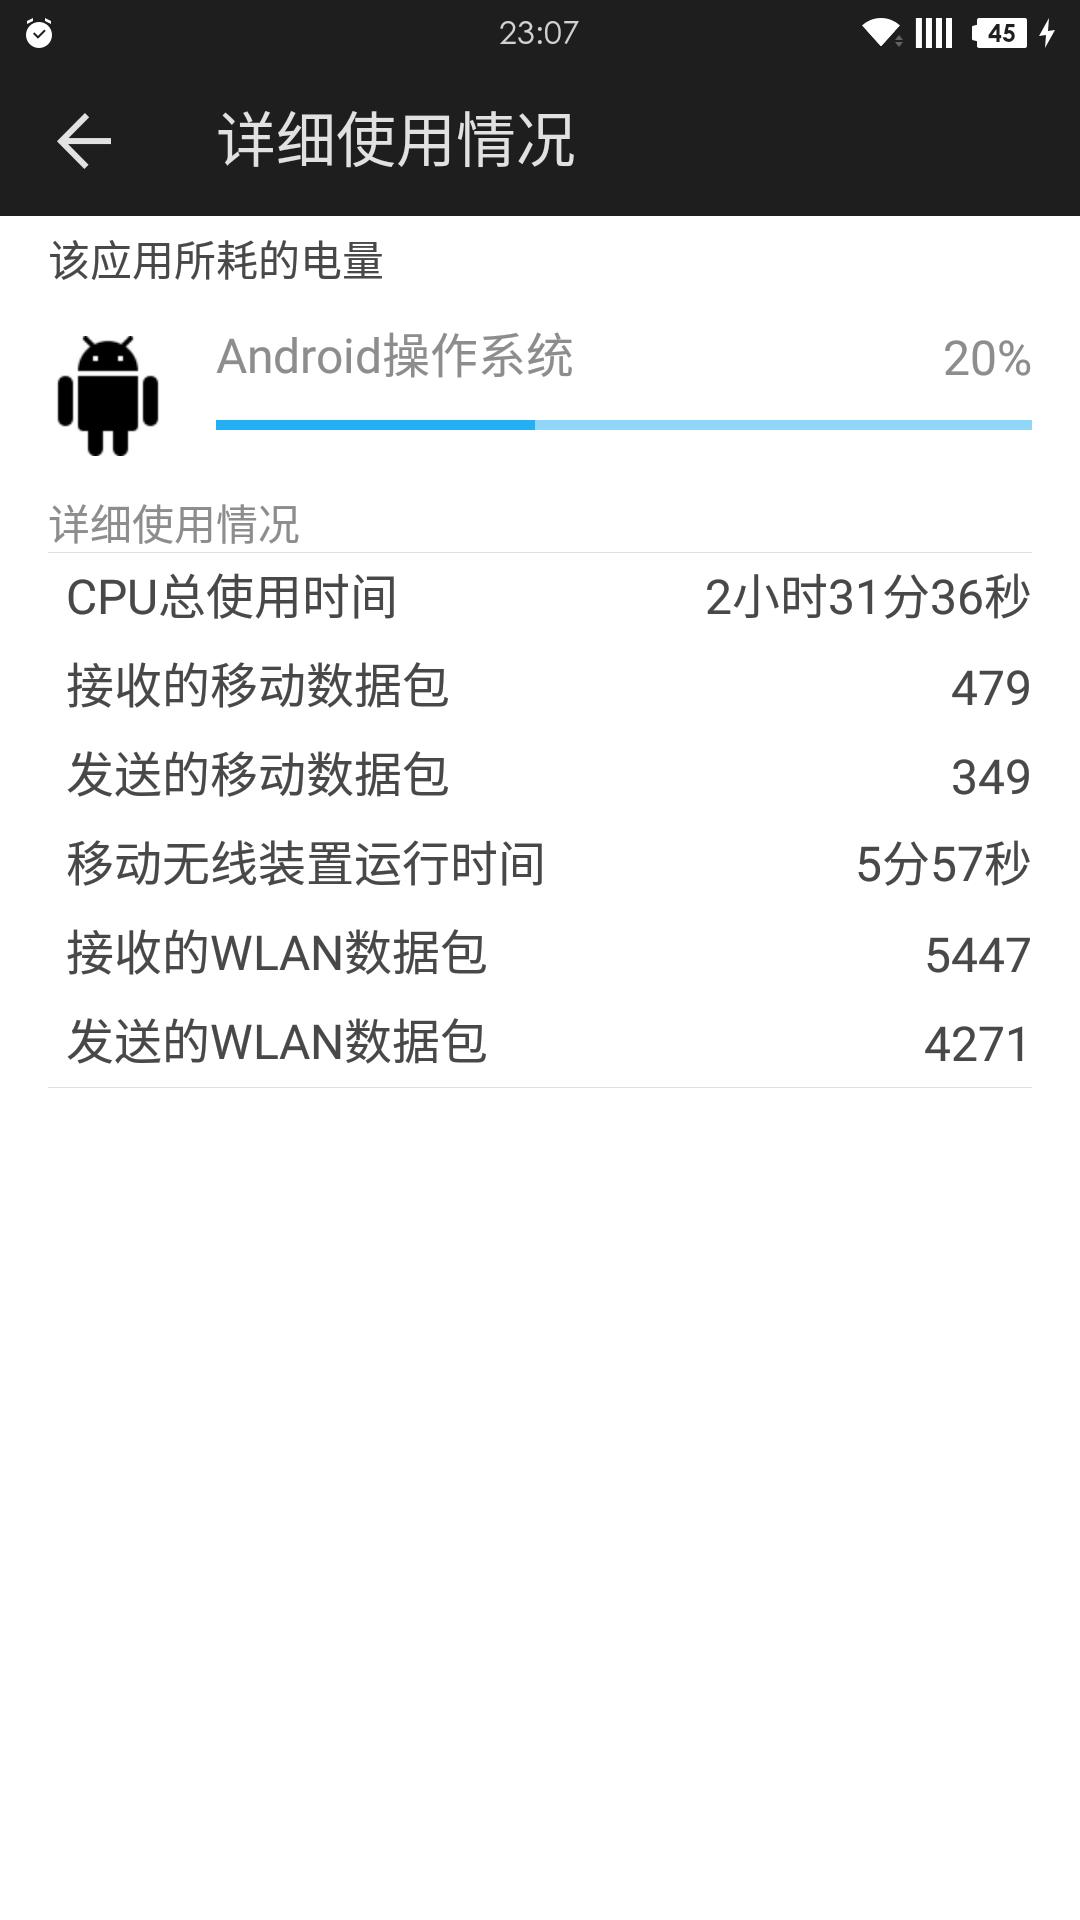 Screenshot_2015-12-21-23-07-03.png